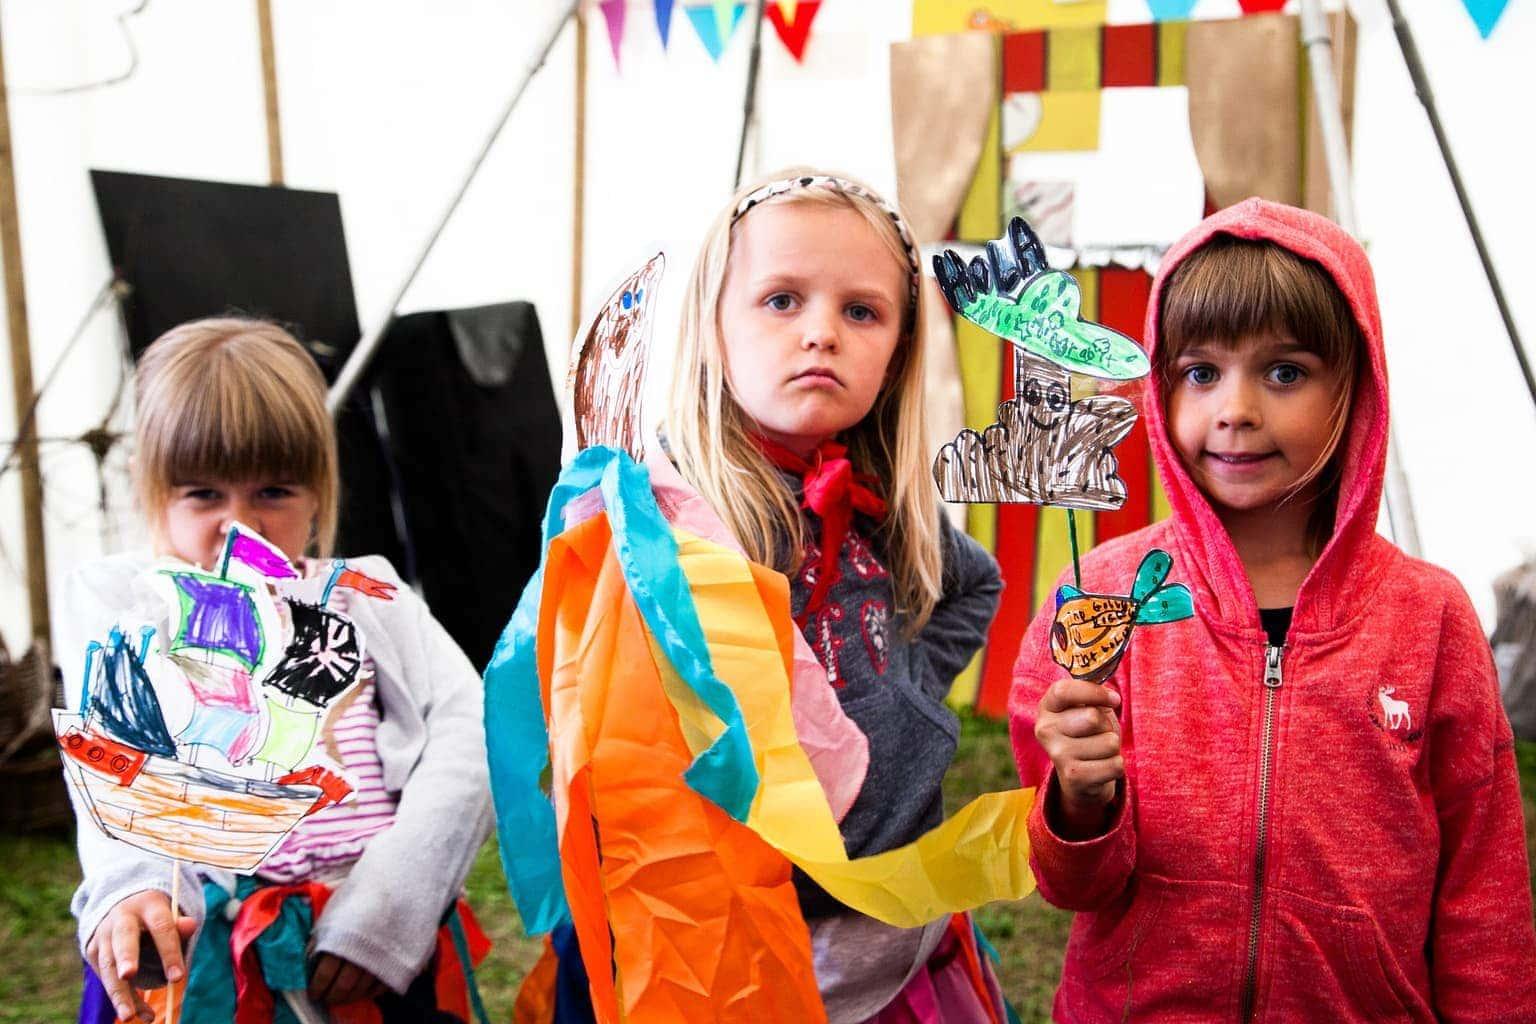 Is Nozstocka Family Friendly Festival?